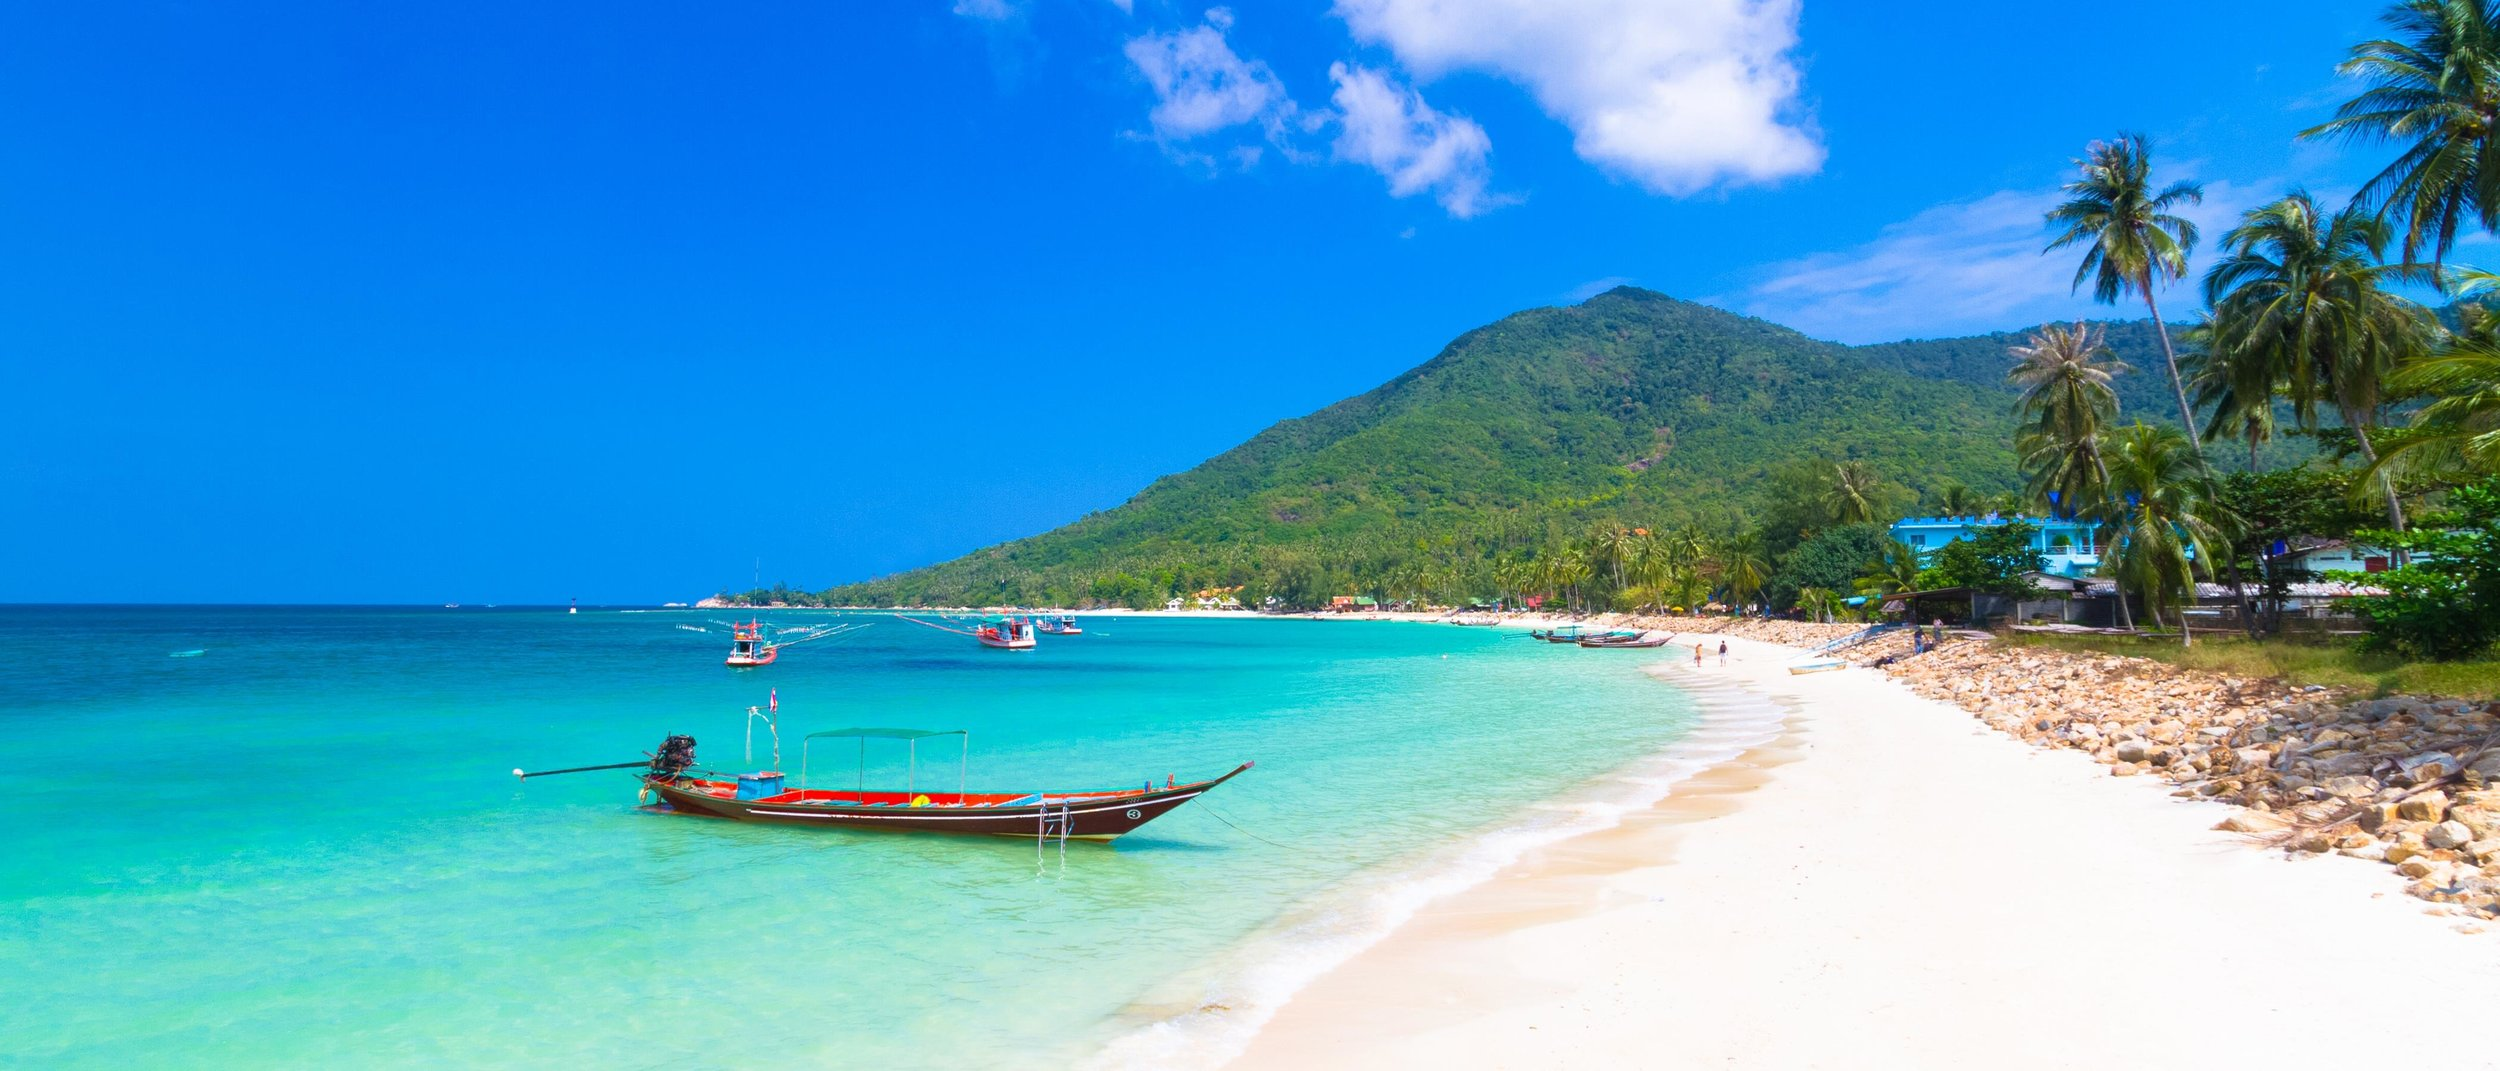 Chaloklam Beach, Koh Phangan